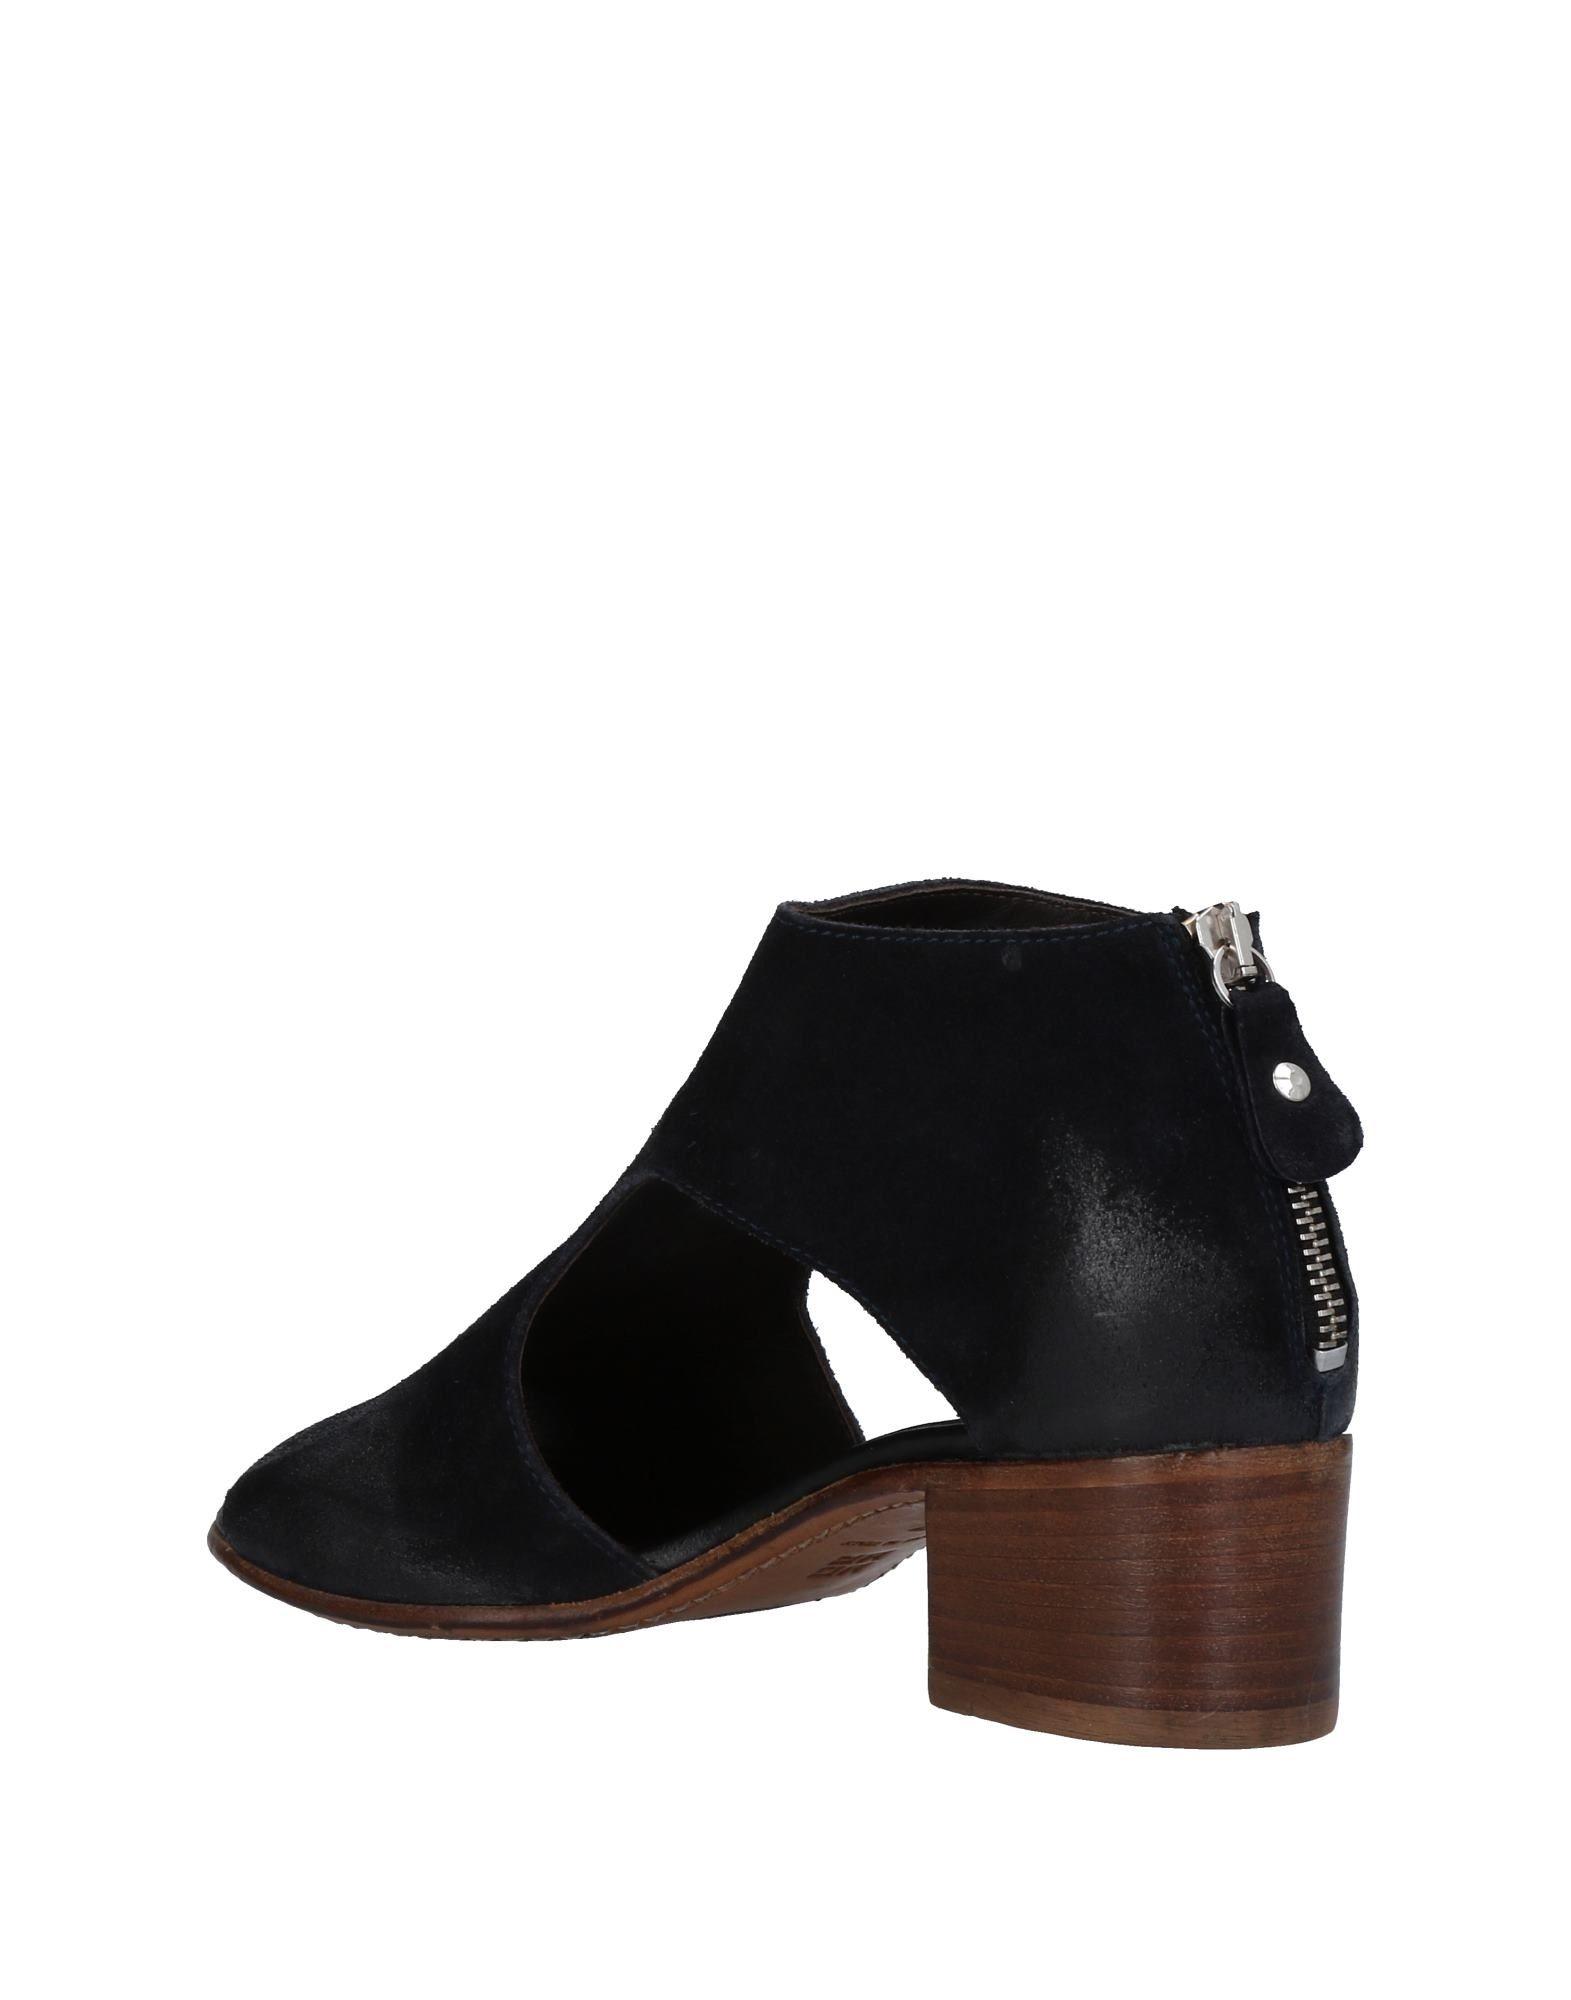 Stilvolle billige Schuhe Damen Moma Sandalen Damen Schuhe  11420442IJ 3a075c